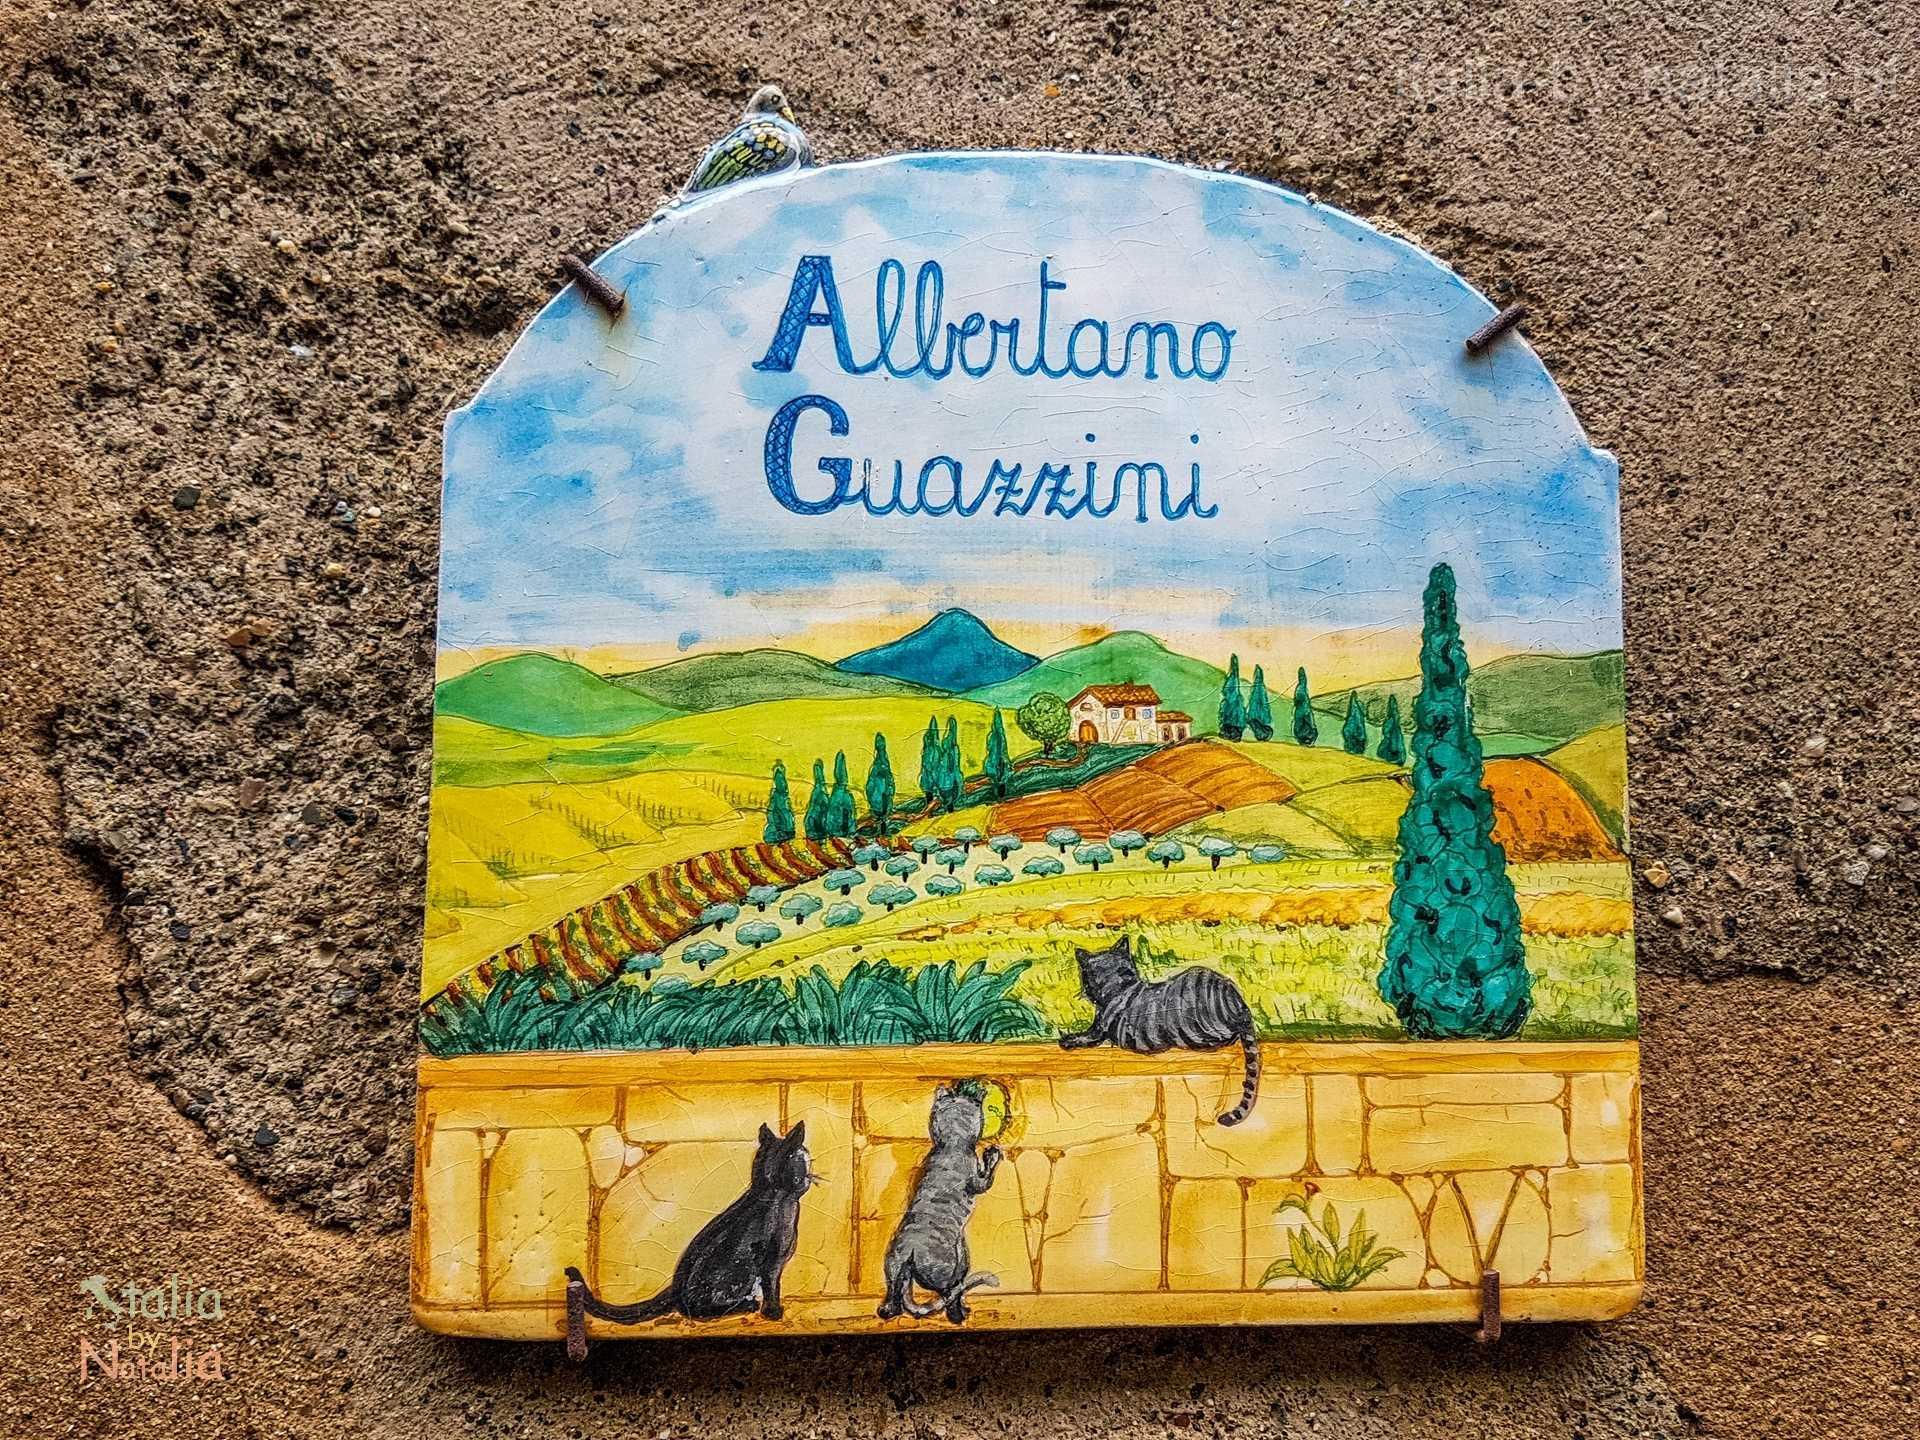 Montegemoli Toskania Tuscany Toscana Val di Cecina małe miasteczko